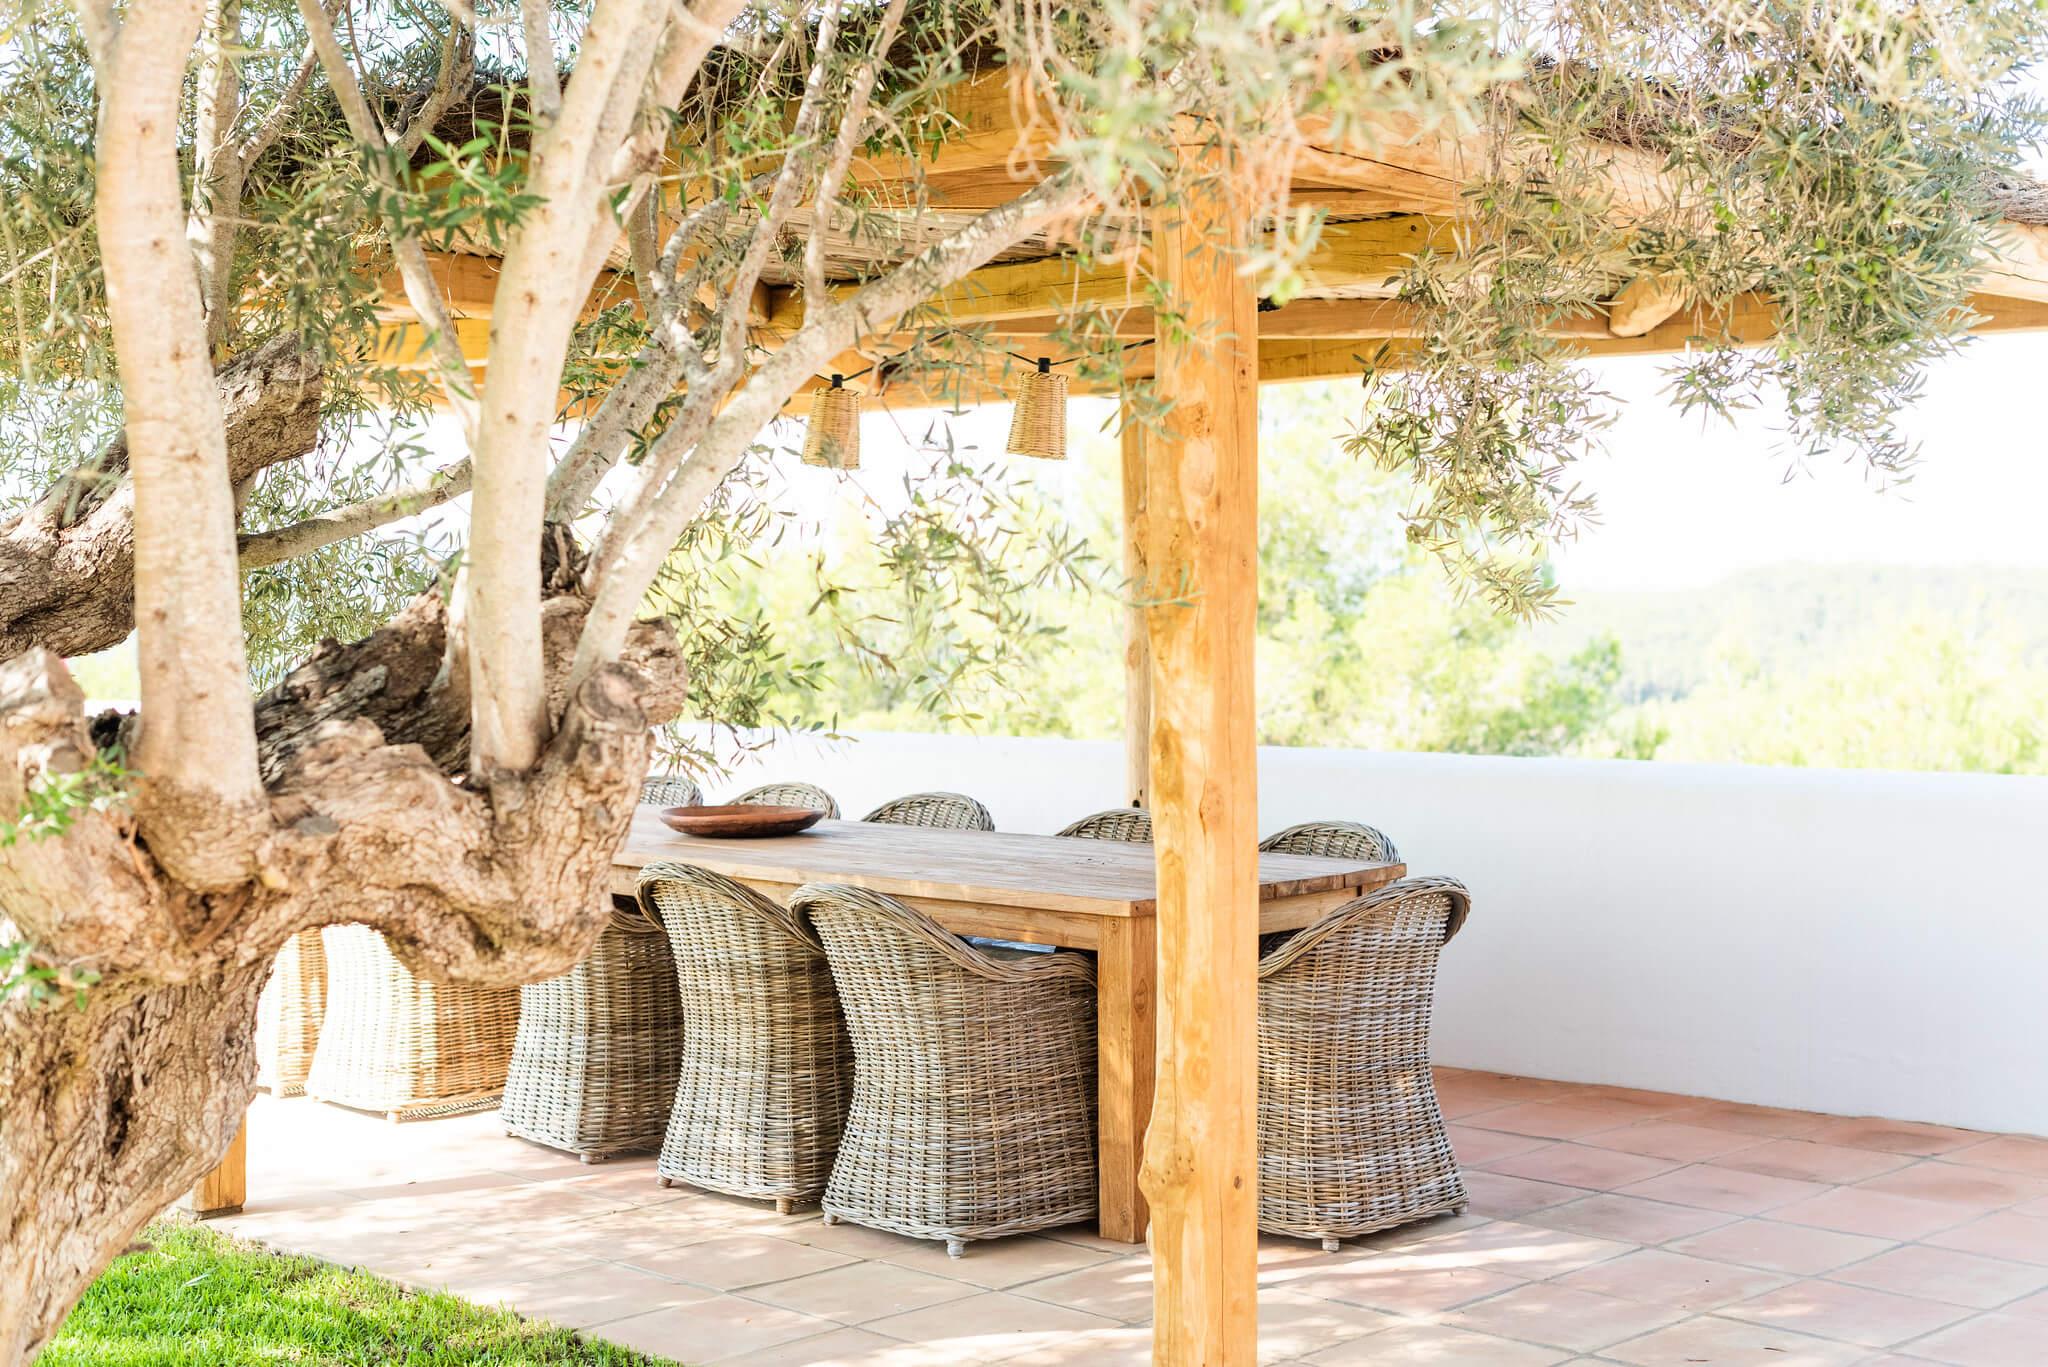 https://www.white-ibiza.com/wp-content/uploads/2020/05/white-ibiza-villas-can-lavanda-outside-dining.jpg